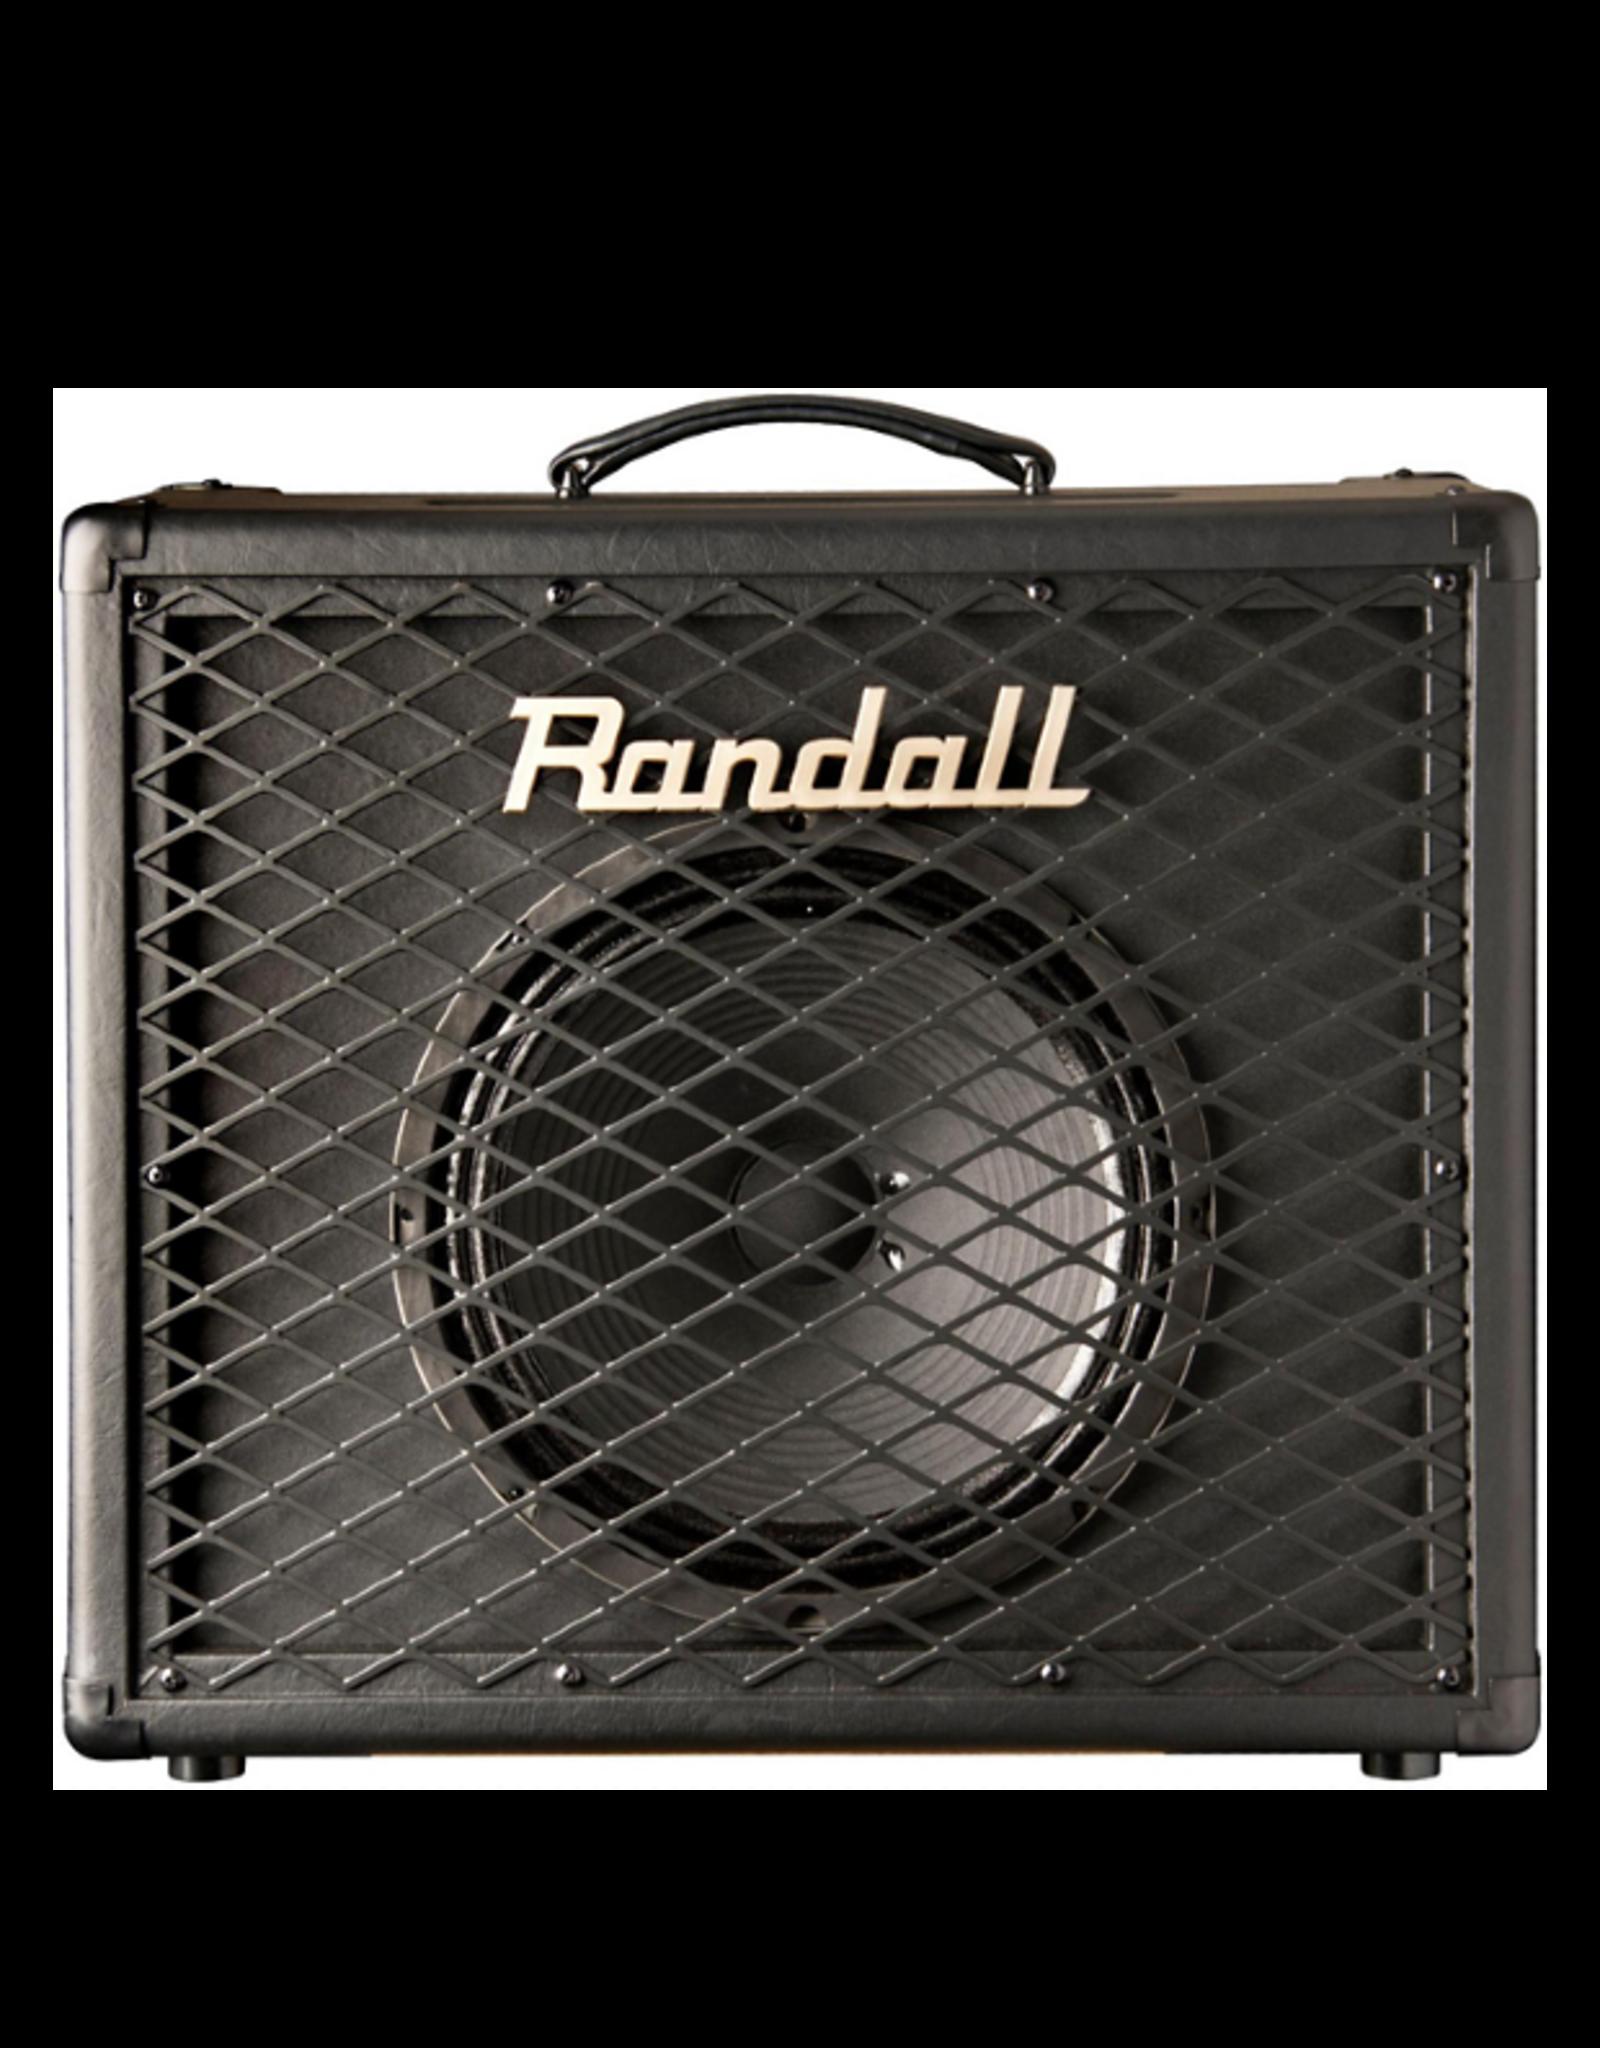 Randall Randall RD20 Diavlo 20W 1x12 Tube Guitar Combo Amp